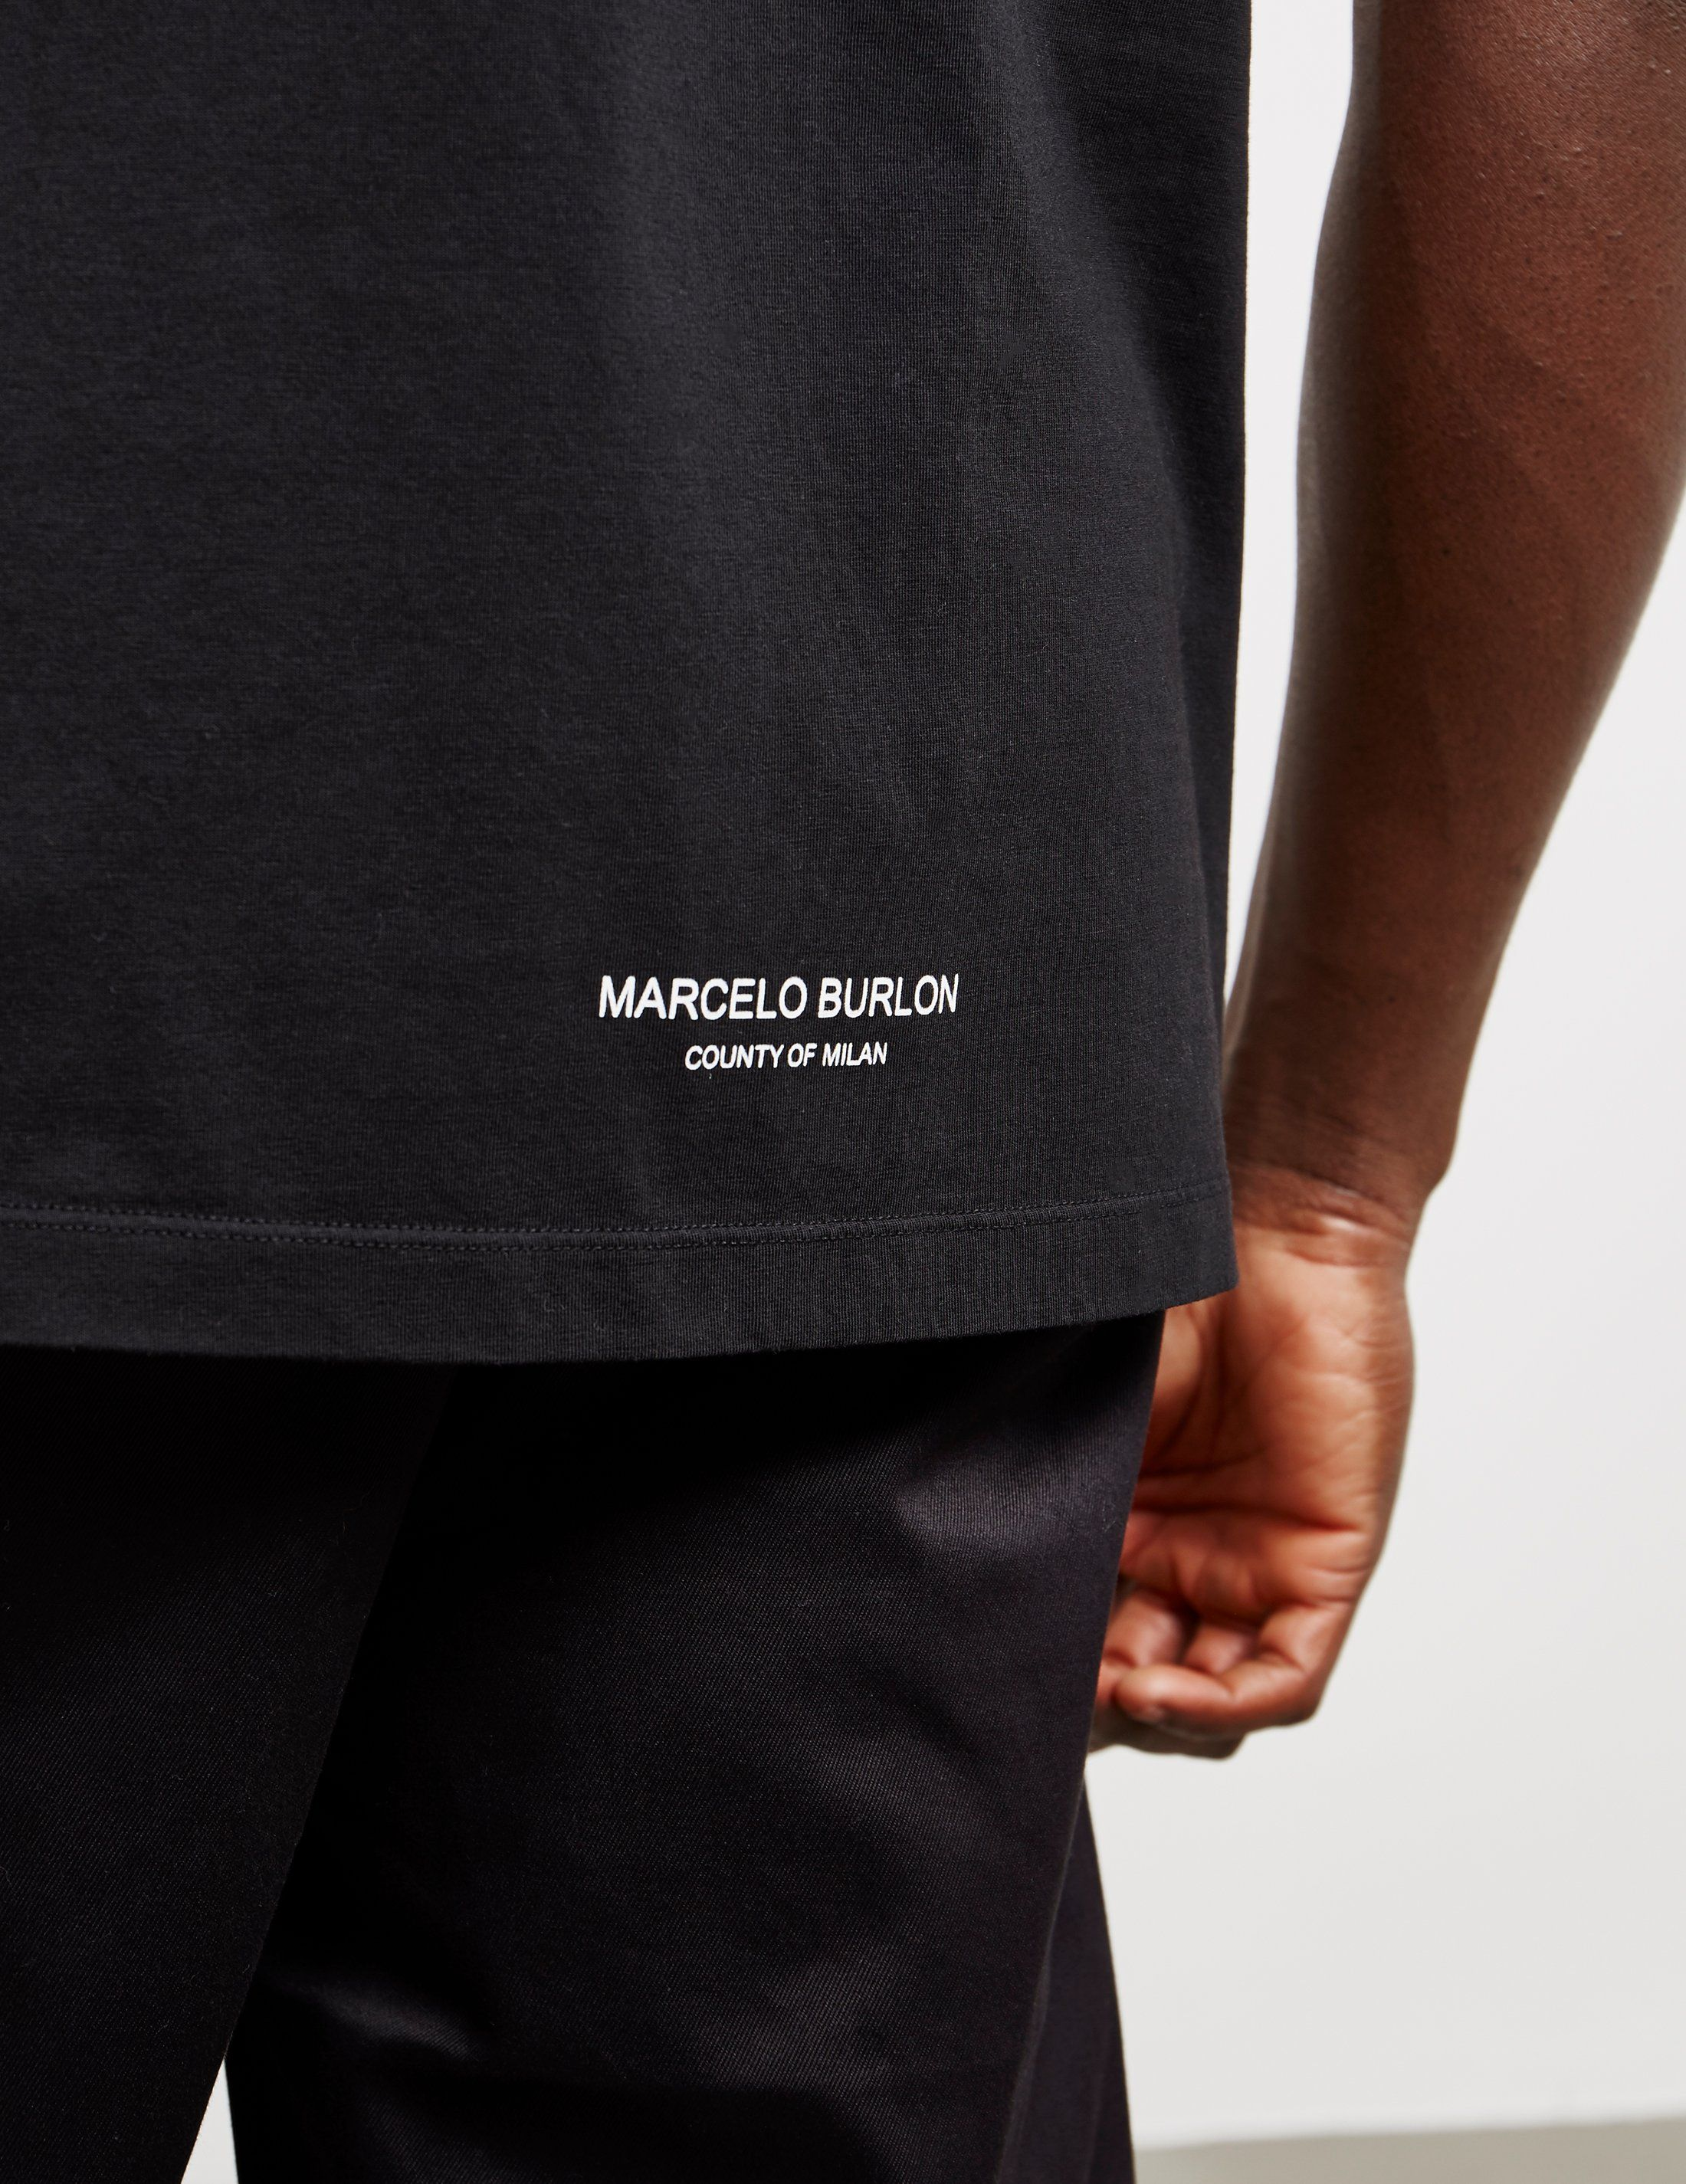 Marcelo Burlon LA Dodgers Short Sleeve T-Shirt - Online Exclusive